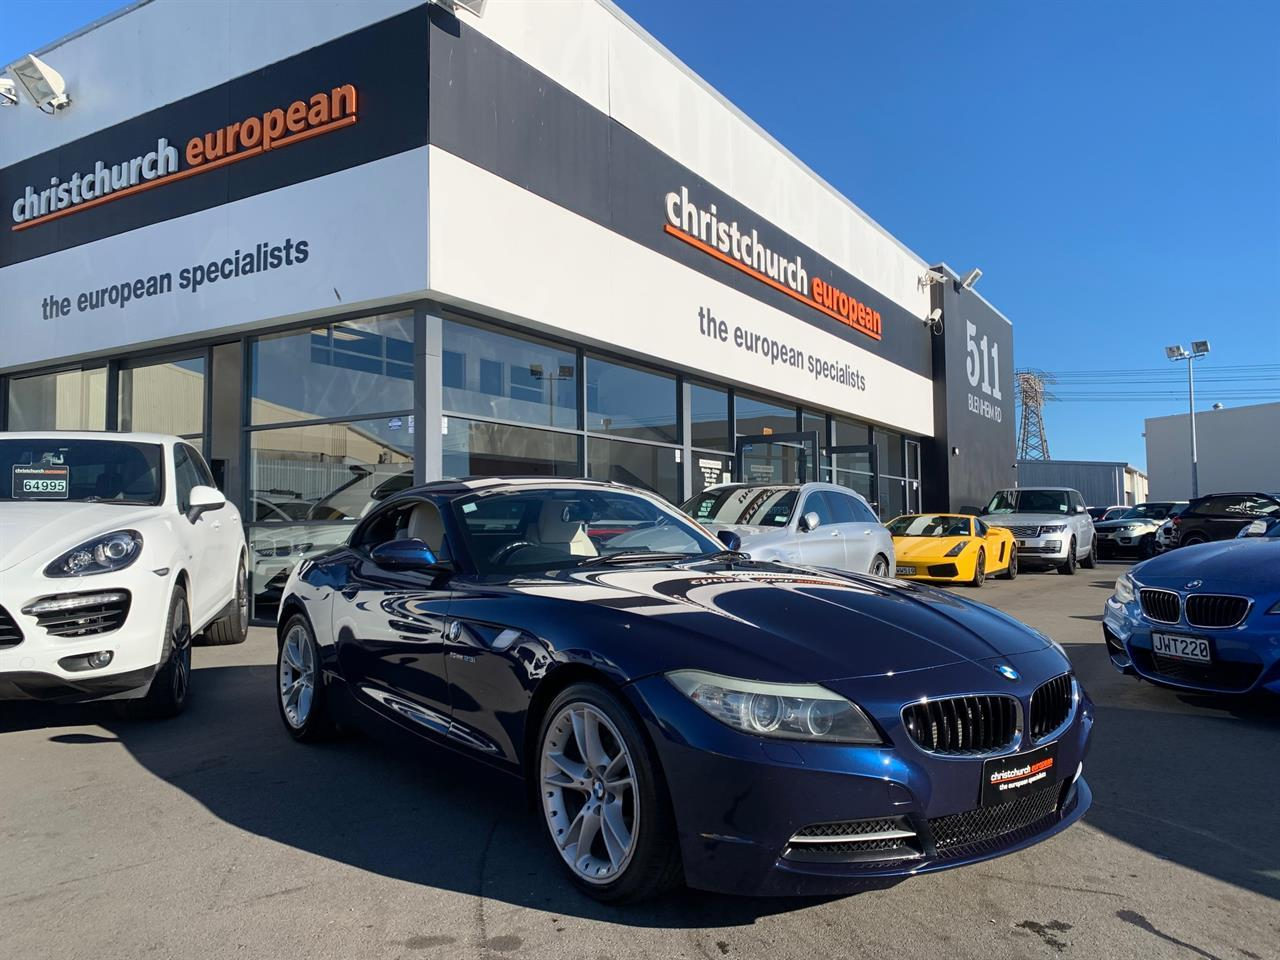 image-0, 2009 BMW Z4 SDrive Hardtop New Shape Convertible at Christchurch